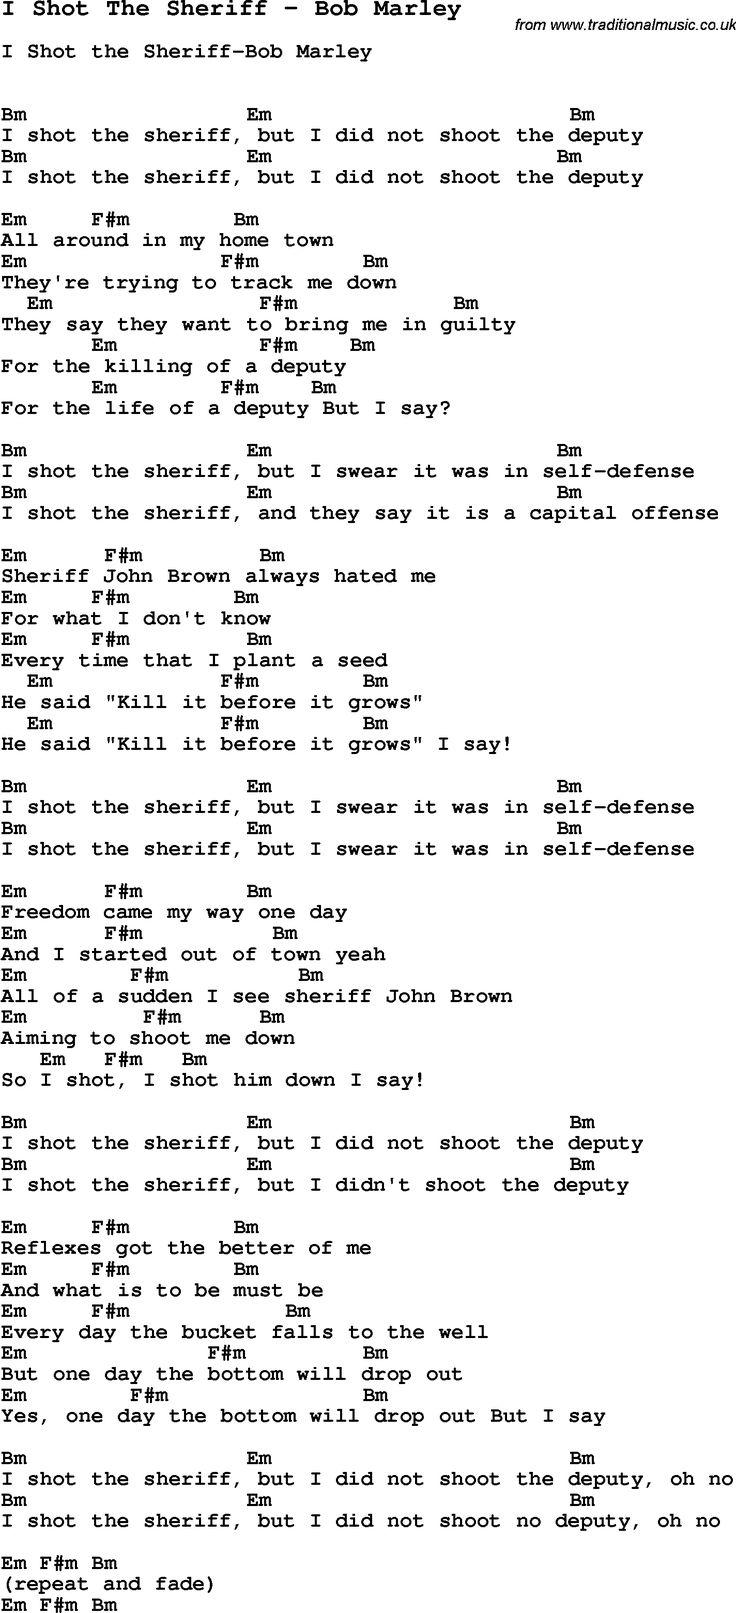 Song I Shot The Sheriff by Bob Marley, with lyrics for vocal performance and accompaniment chords for Ukulele, Guitar Banjo etc.